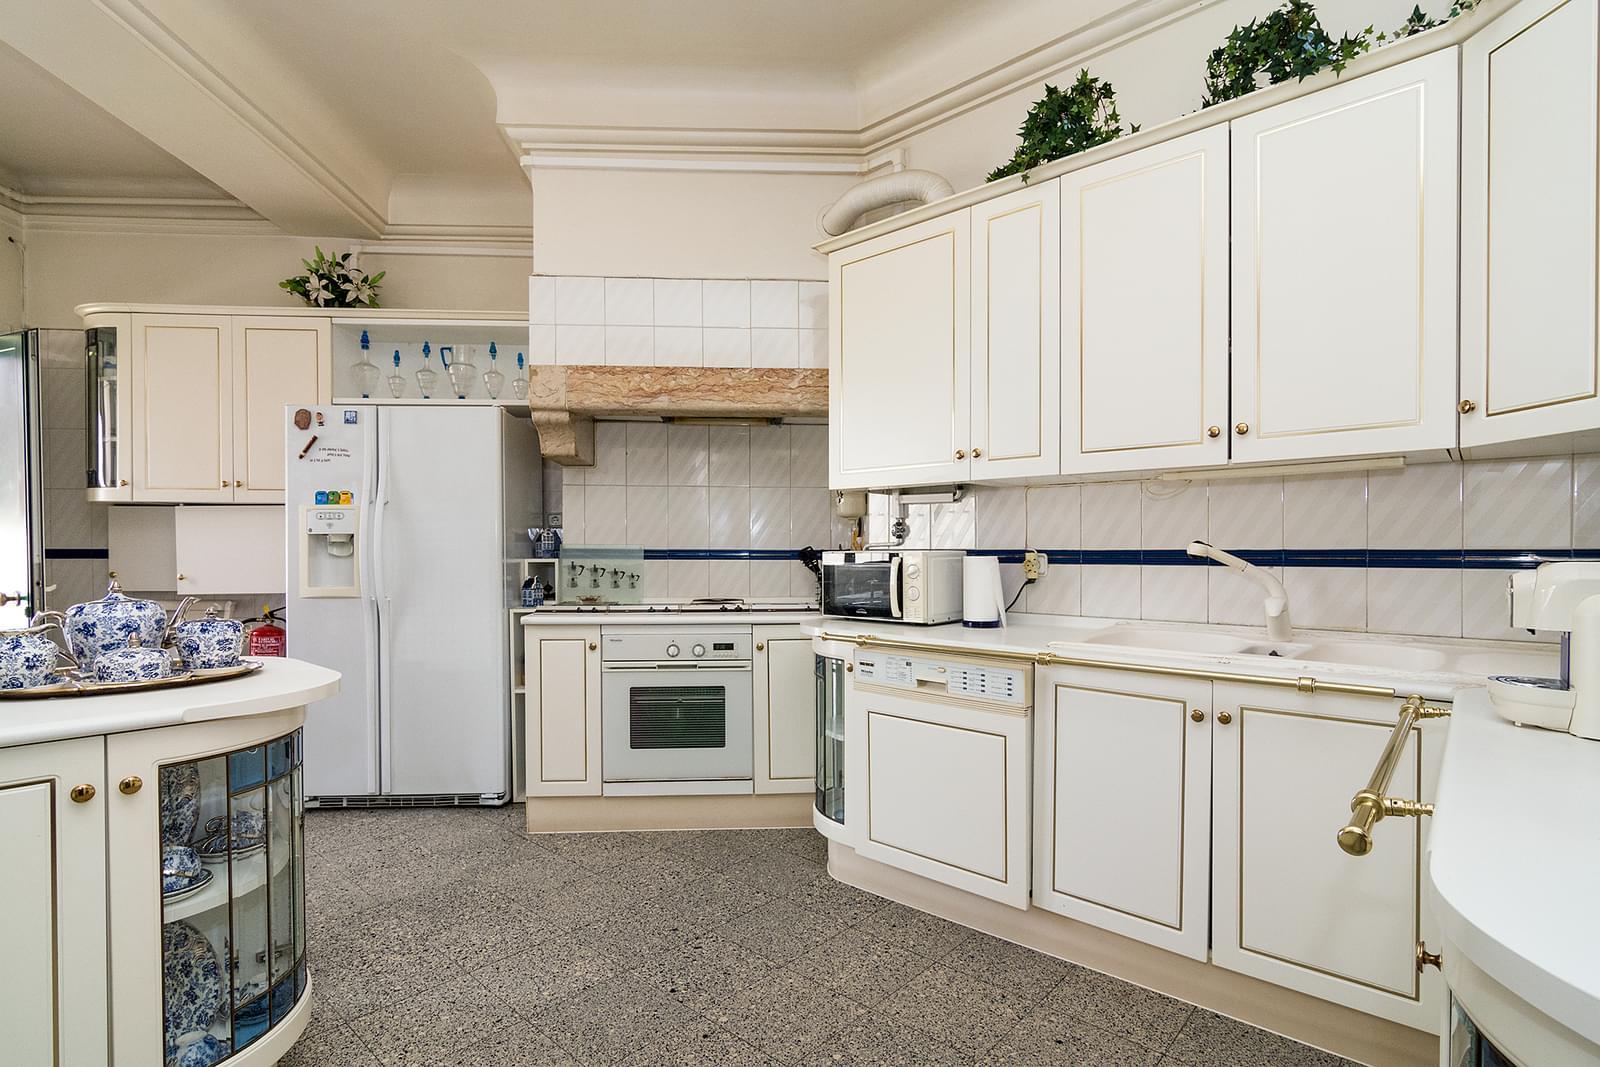 pf17510-apartamento-t4-1-lisboa-7ff72aa3-0b6f-4850-b6e7-34960cc41fb1